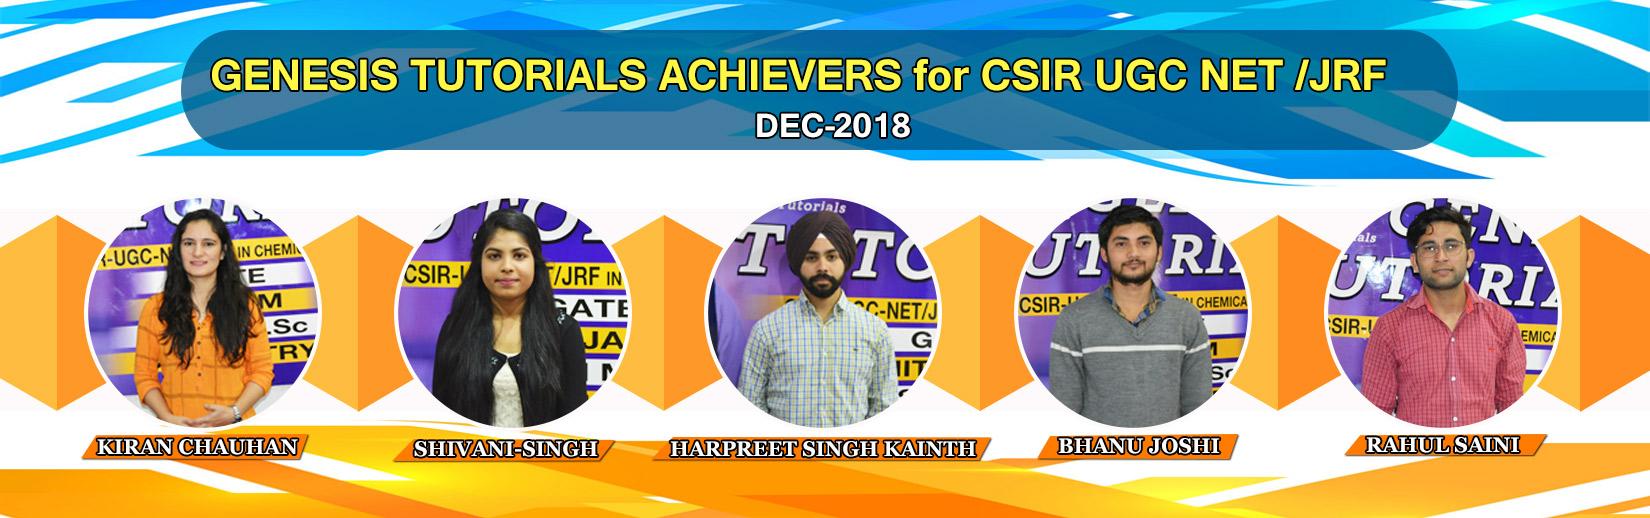 CSIR UGC NET / JRF Results-2018